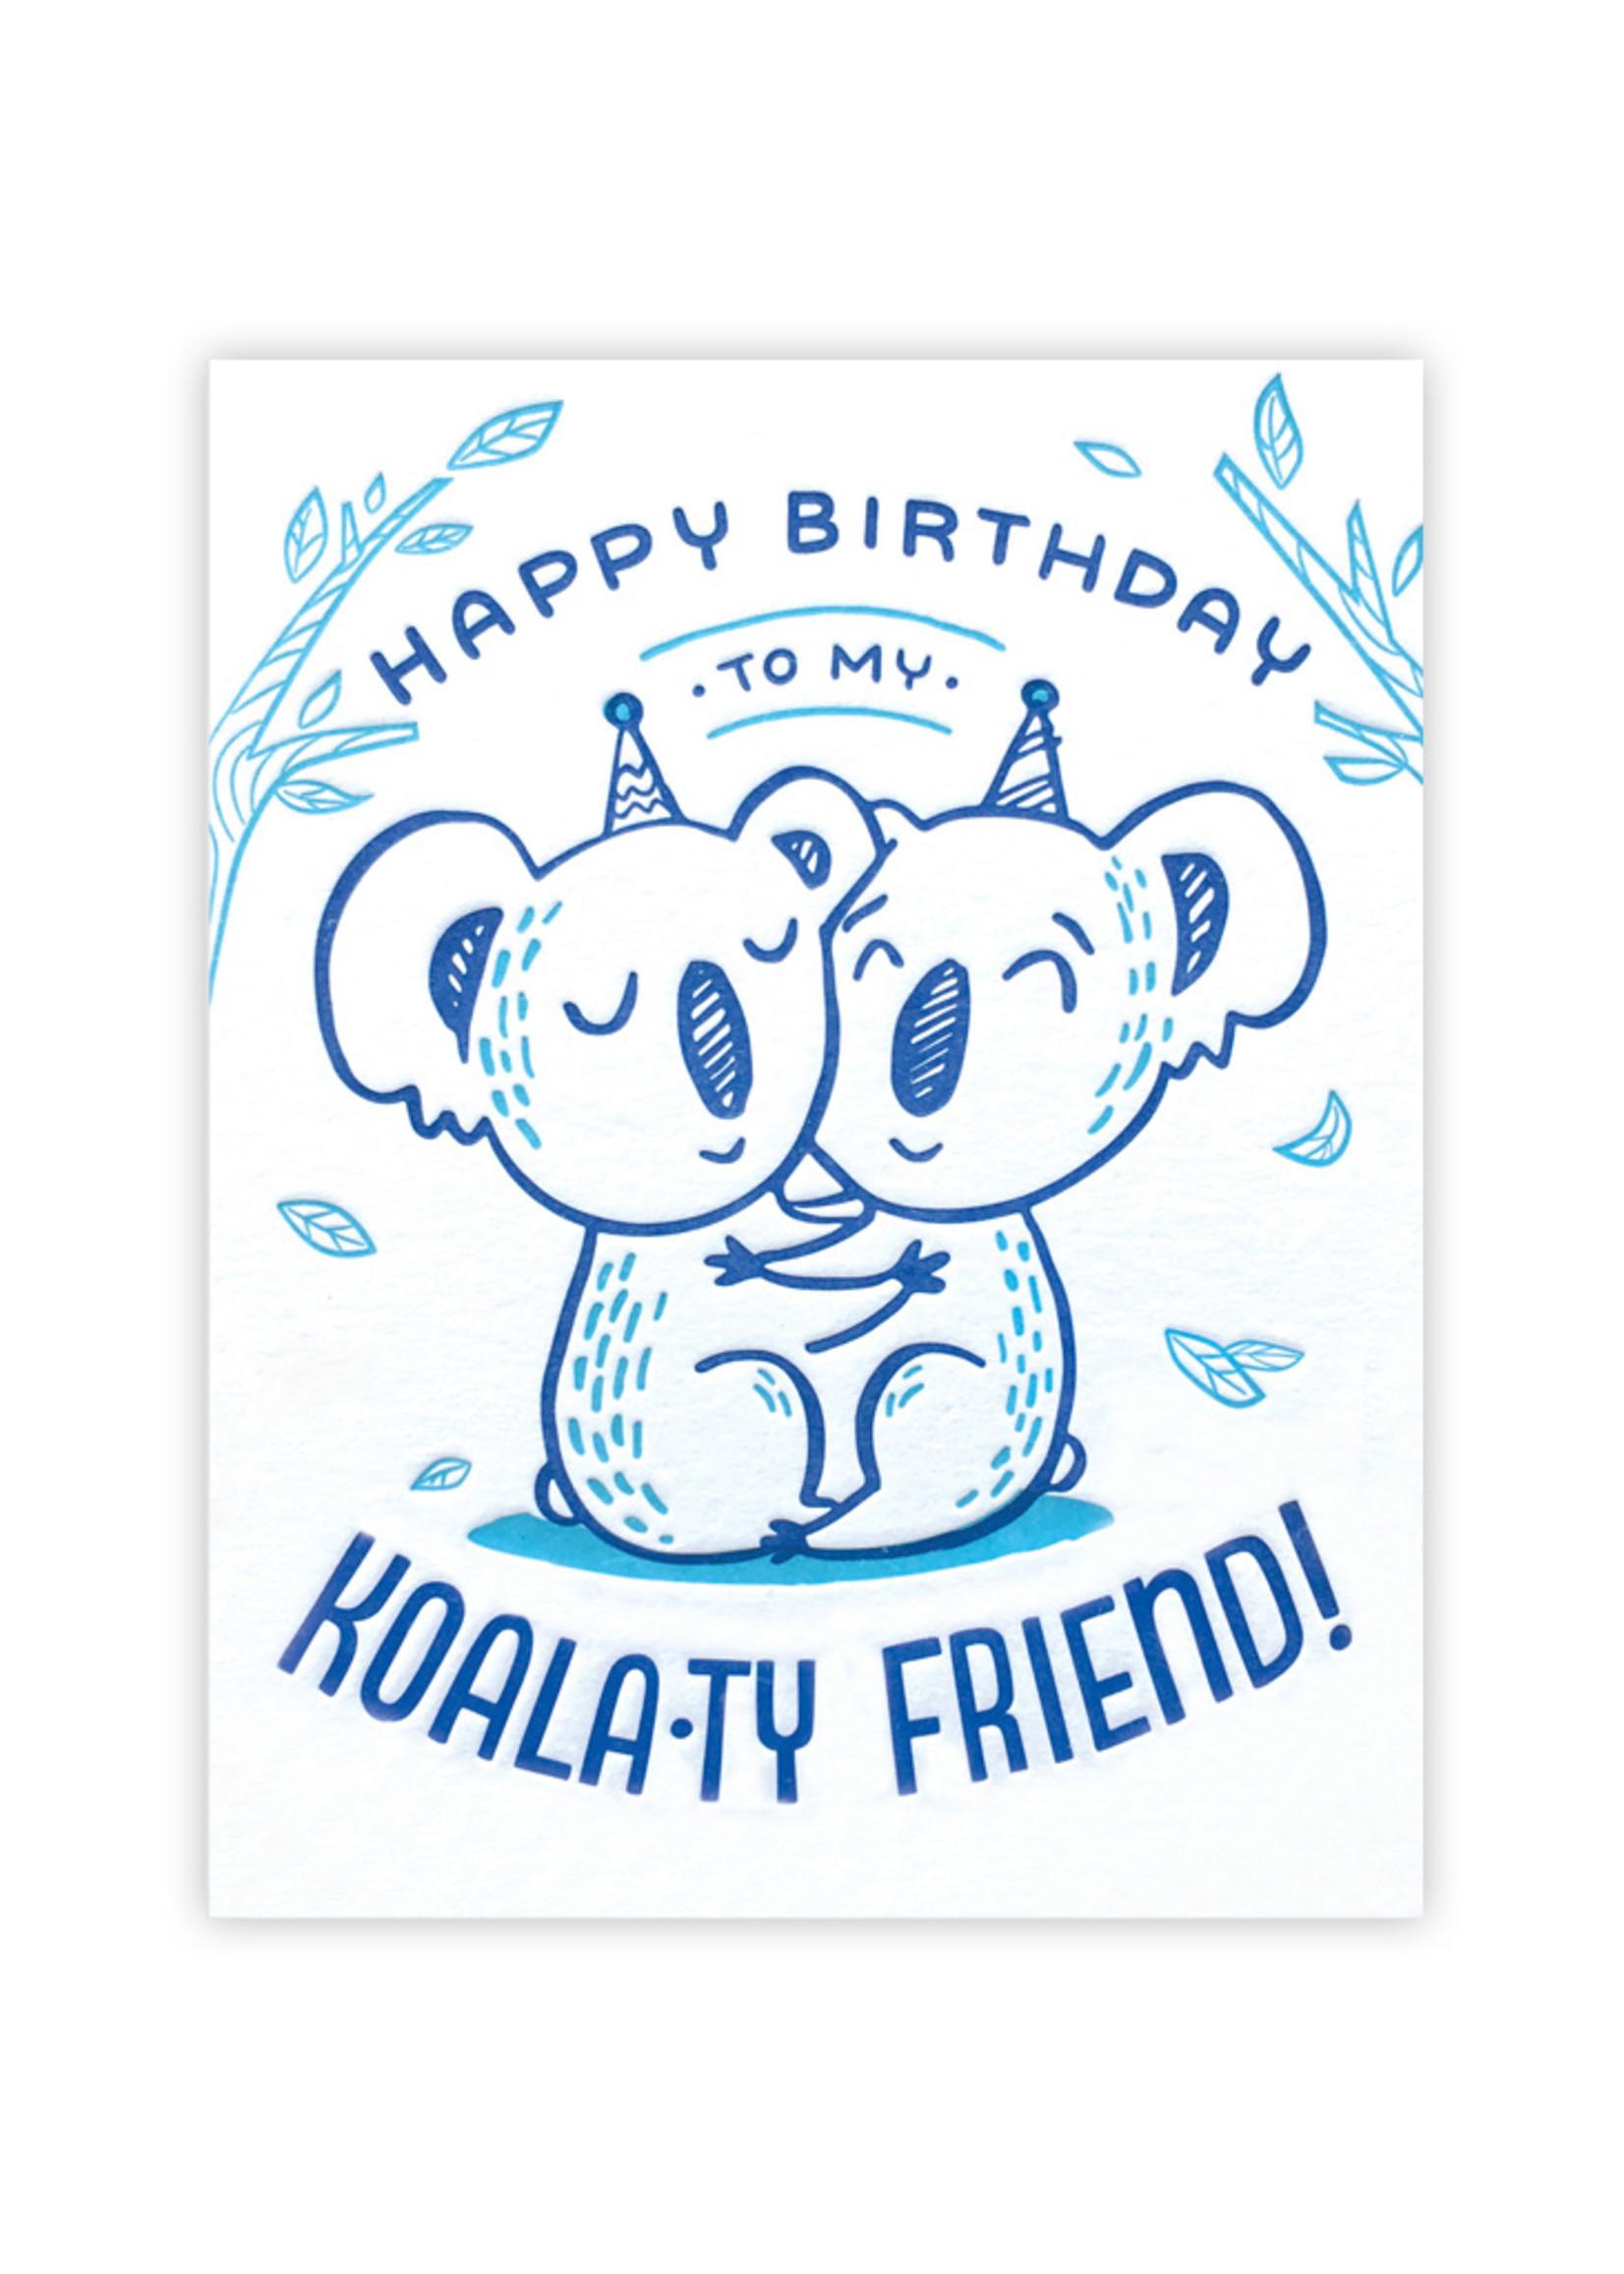 Good Paper Koala-ty Friend Birthday Card